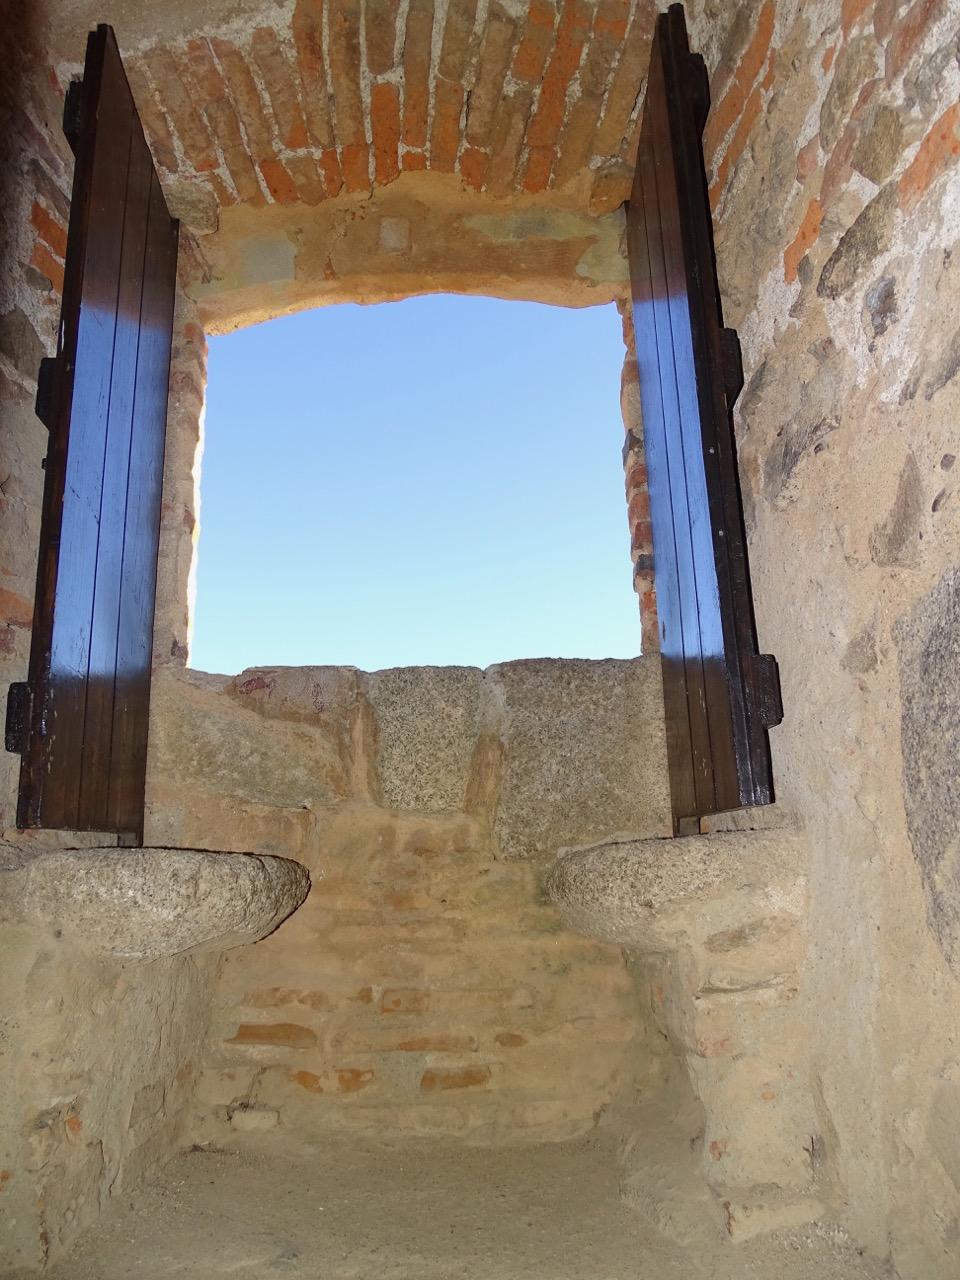 The castle's window